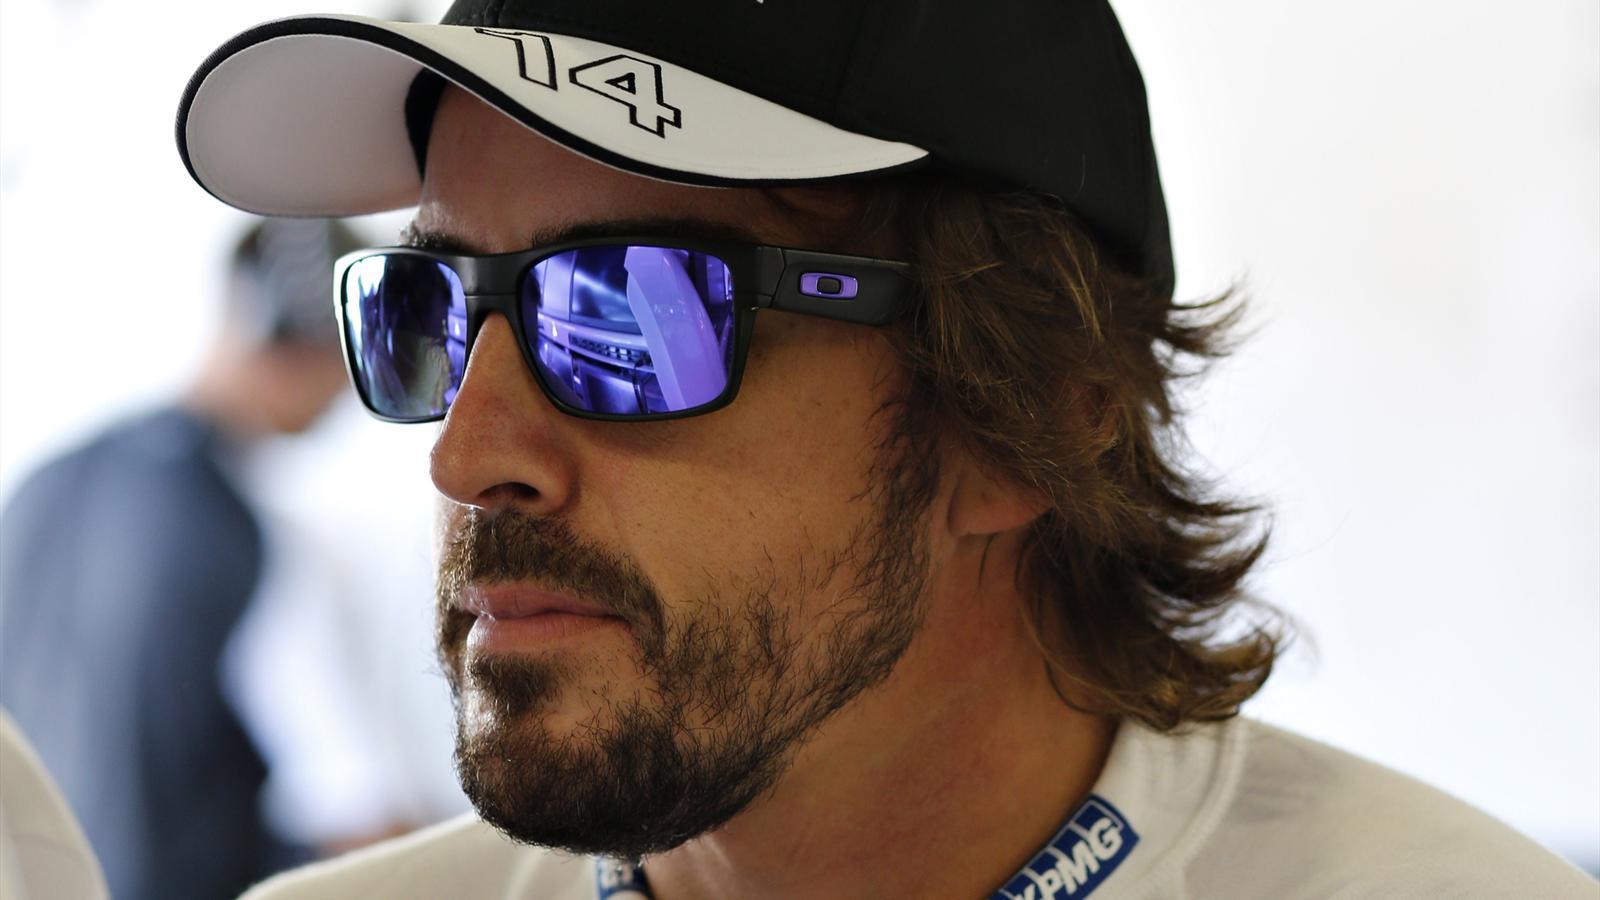 Fernando Alonso (McLaren) au Grand Prix d'Italie 2015